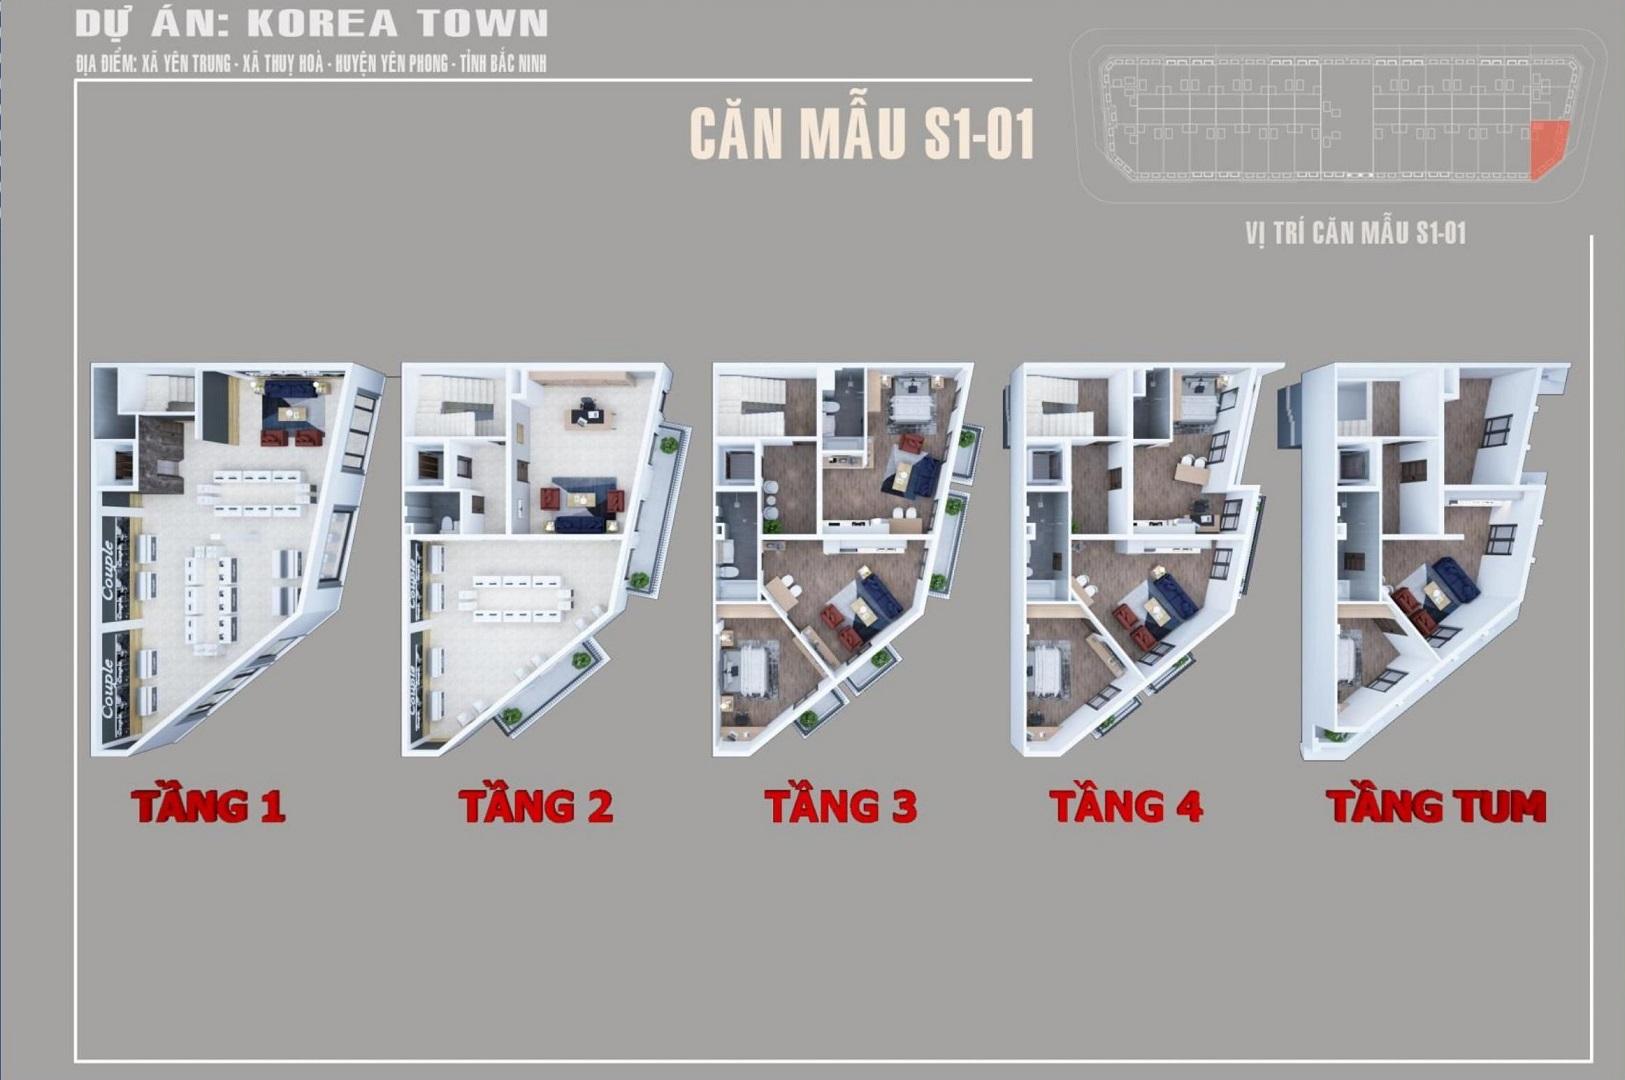 thiết kế shophouse korea town yên phong